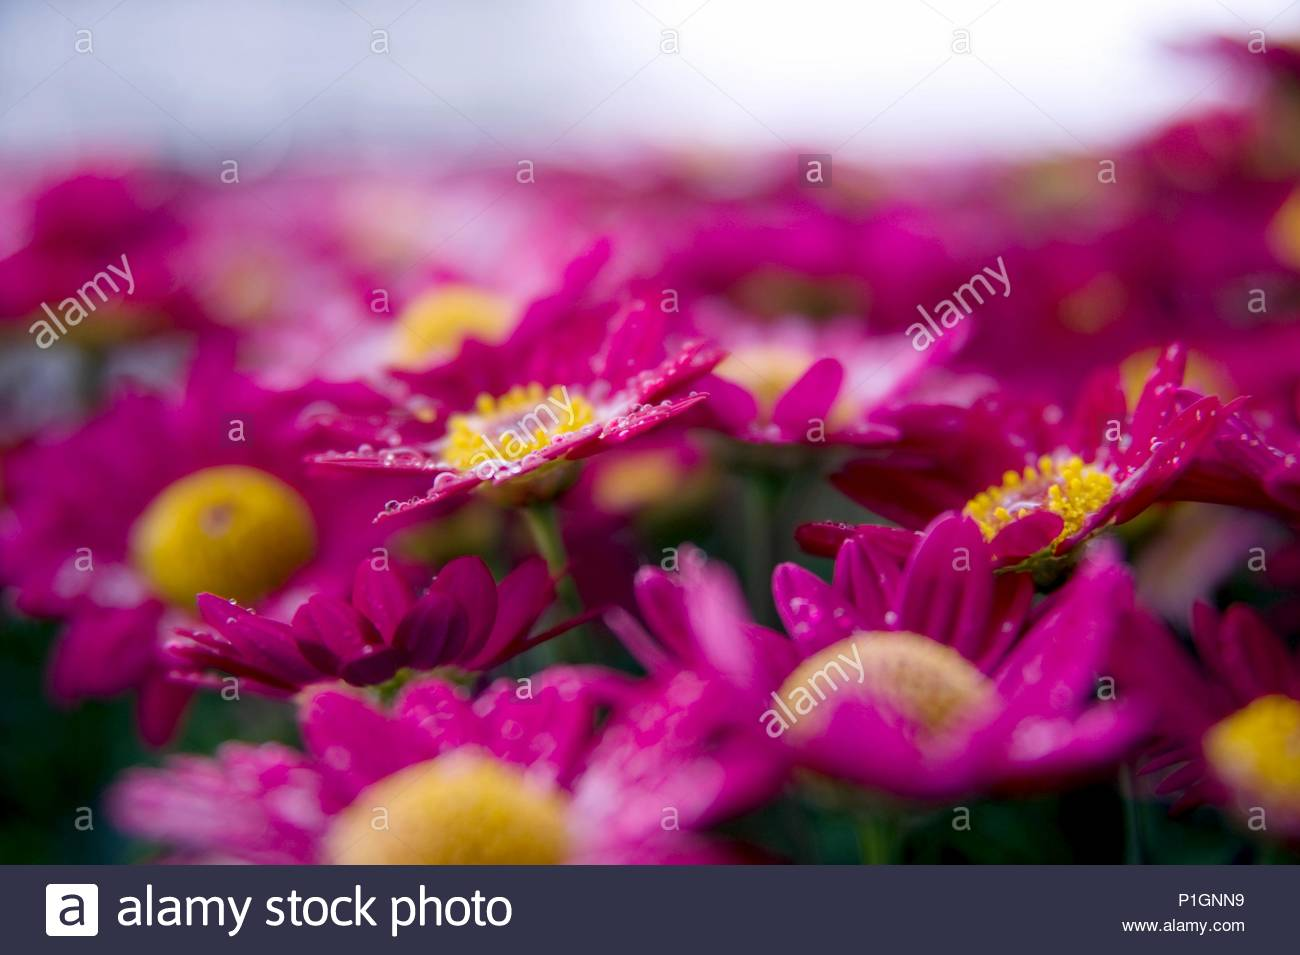 Red daisy flower bluetree flower raindrop stock photo 207507365 alamy red daisy flower bluetree flower raindrop izmirmasajfo